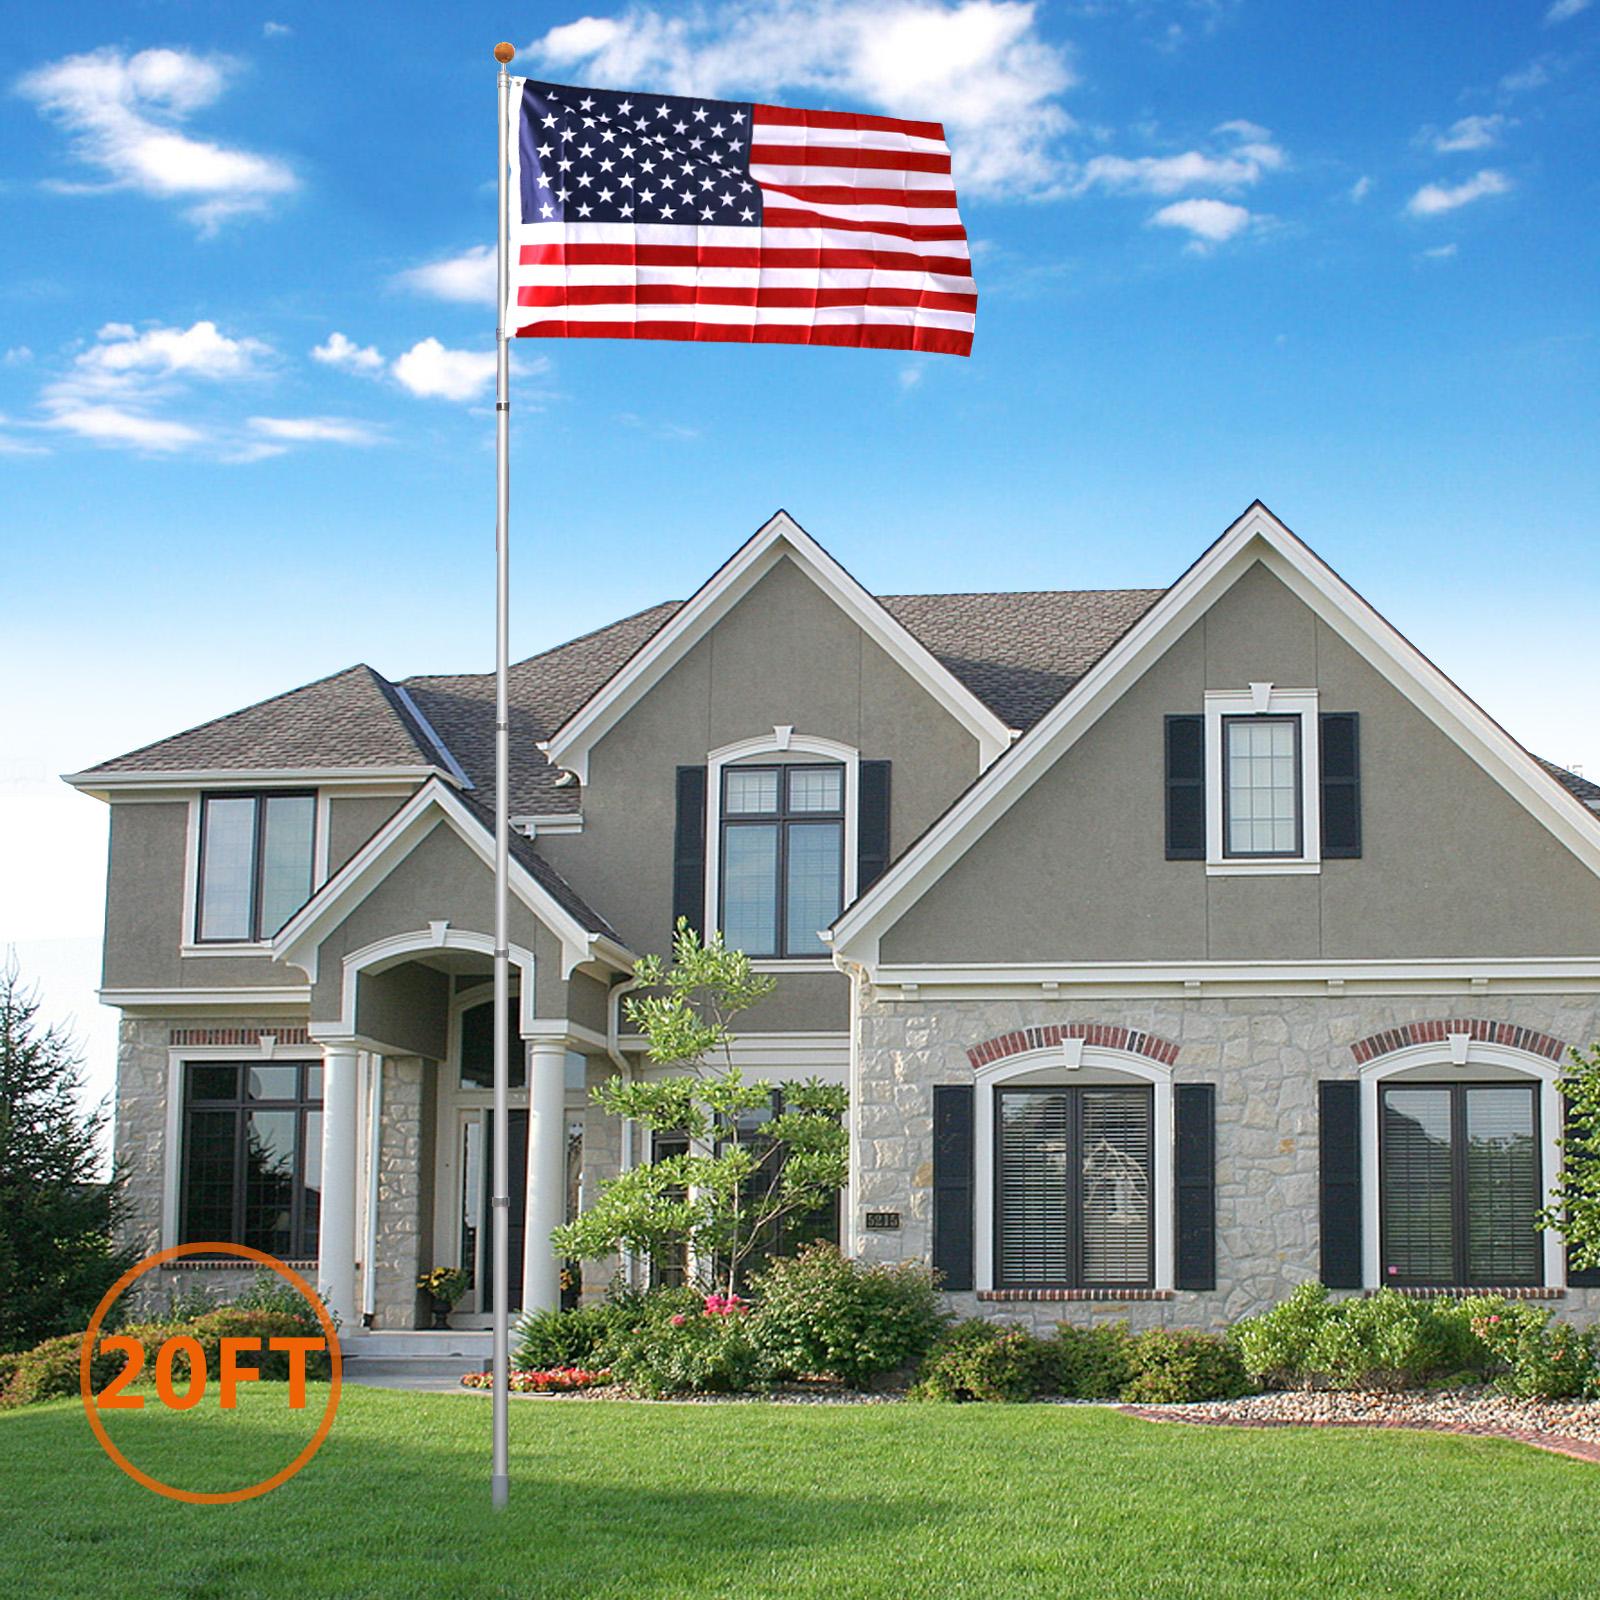 ZENY 20Ft Aluminum Telescoping Flag pole Kit Outdoor Gold Ball + 1 US America Flag New